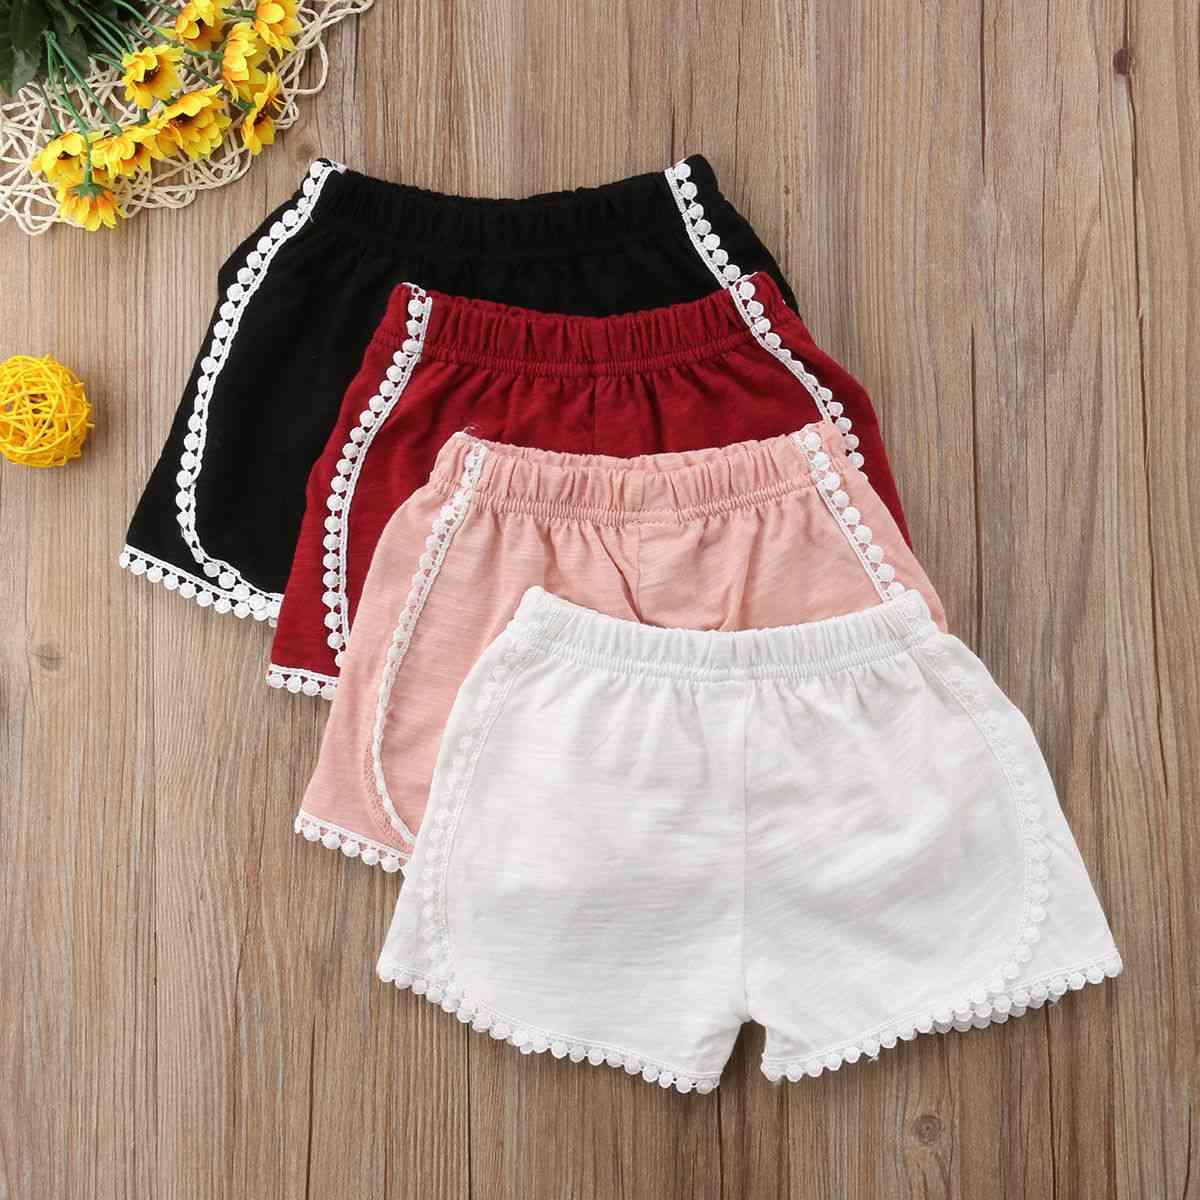 Girl Pants, Newborn Baby Kids Harem, Pants Shorts